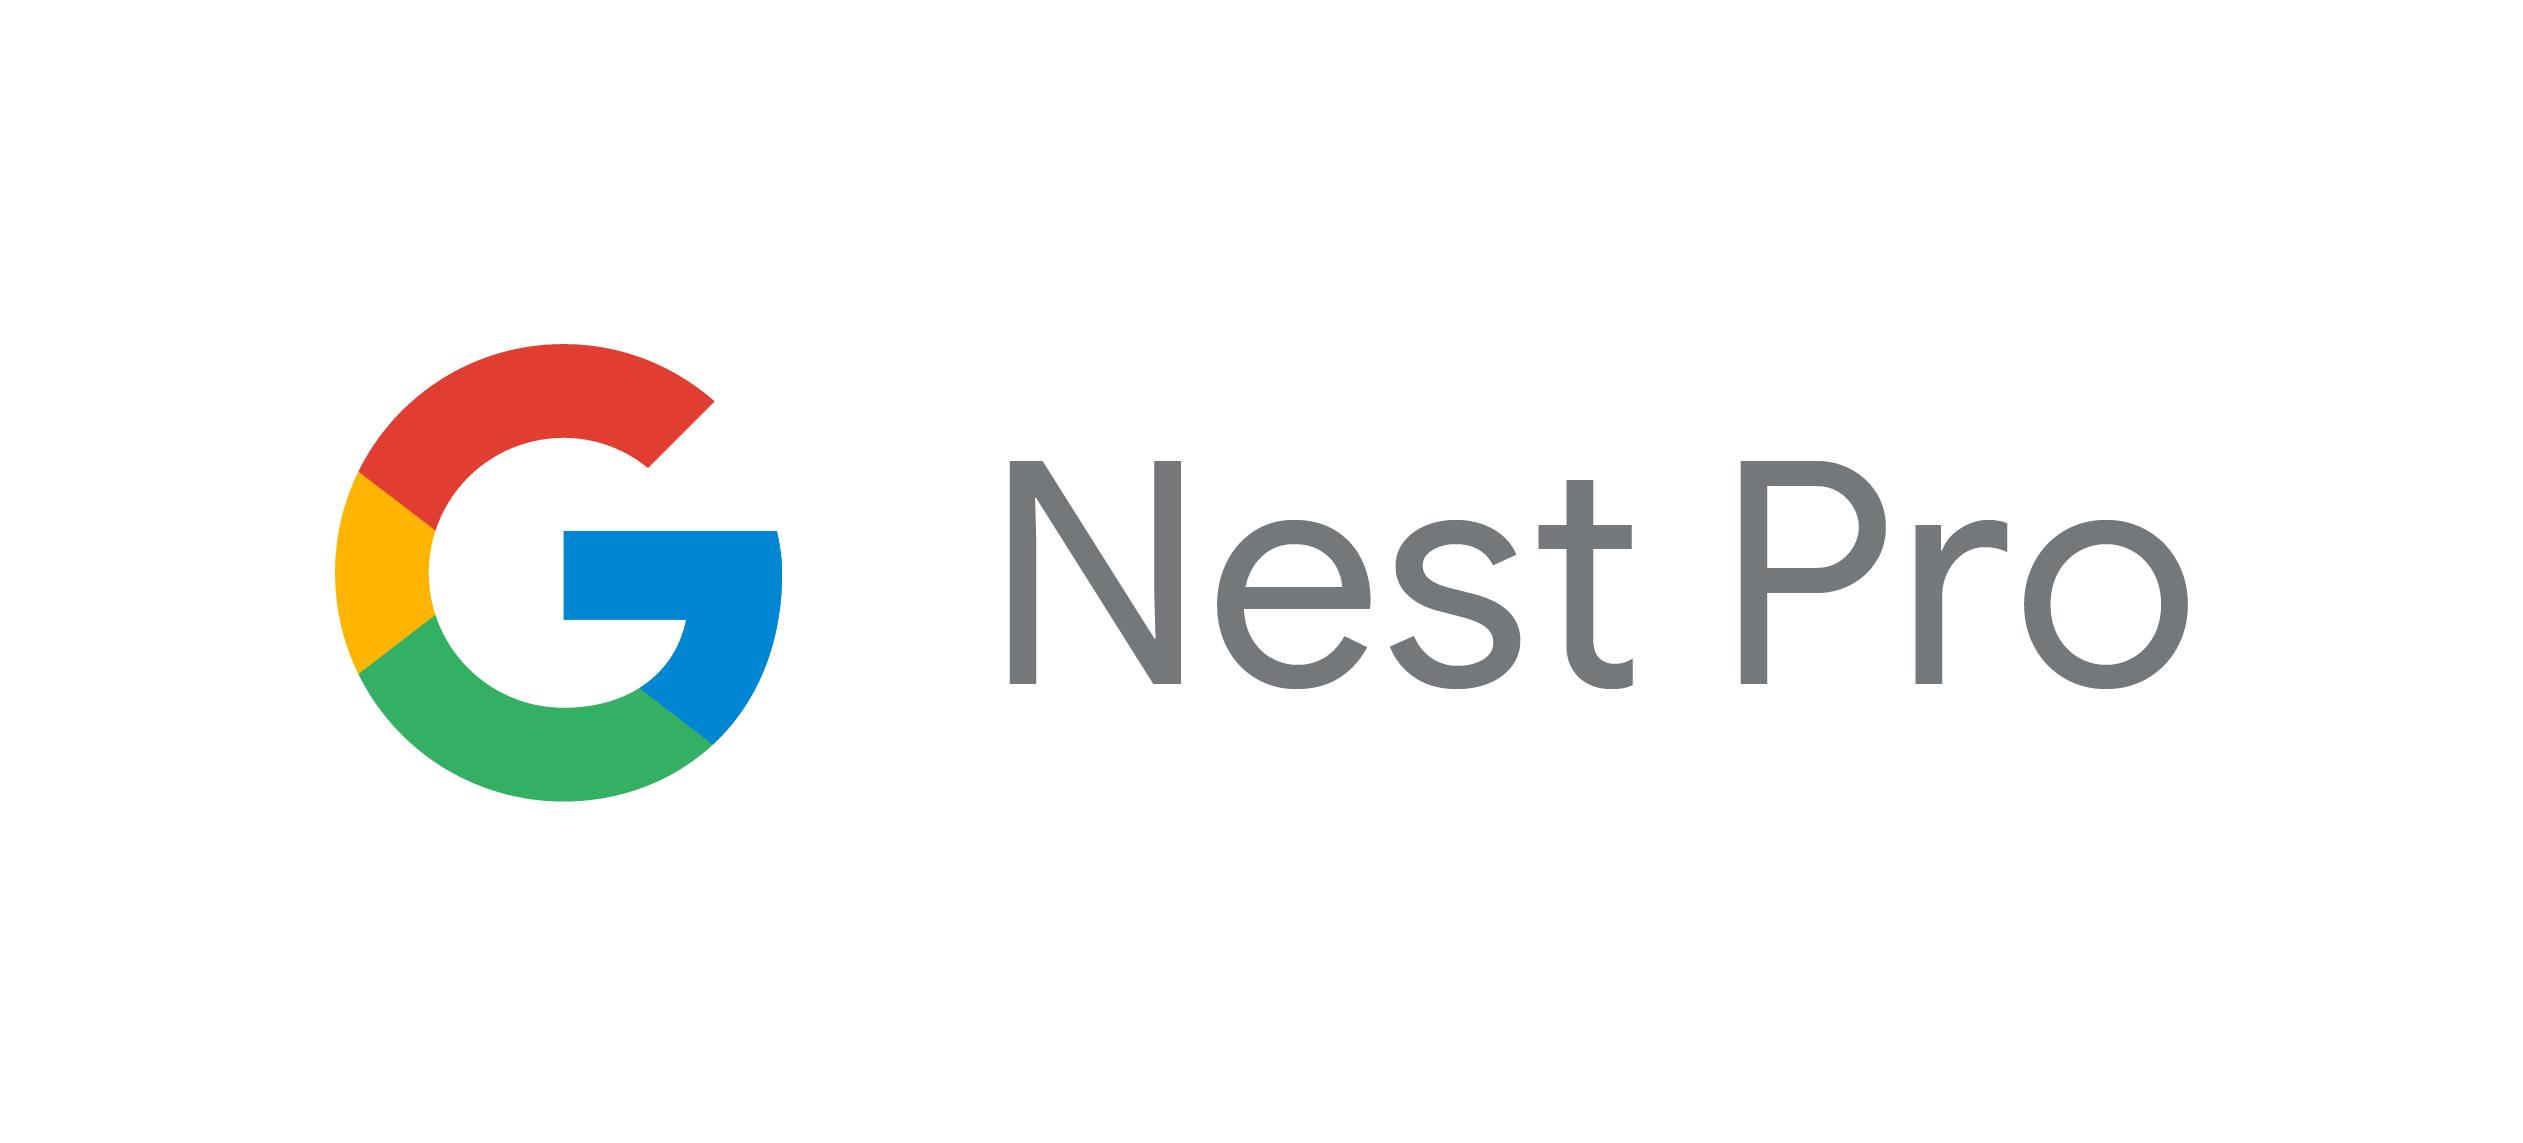 Google Nest Pro